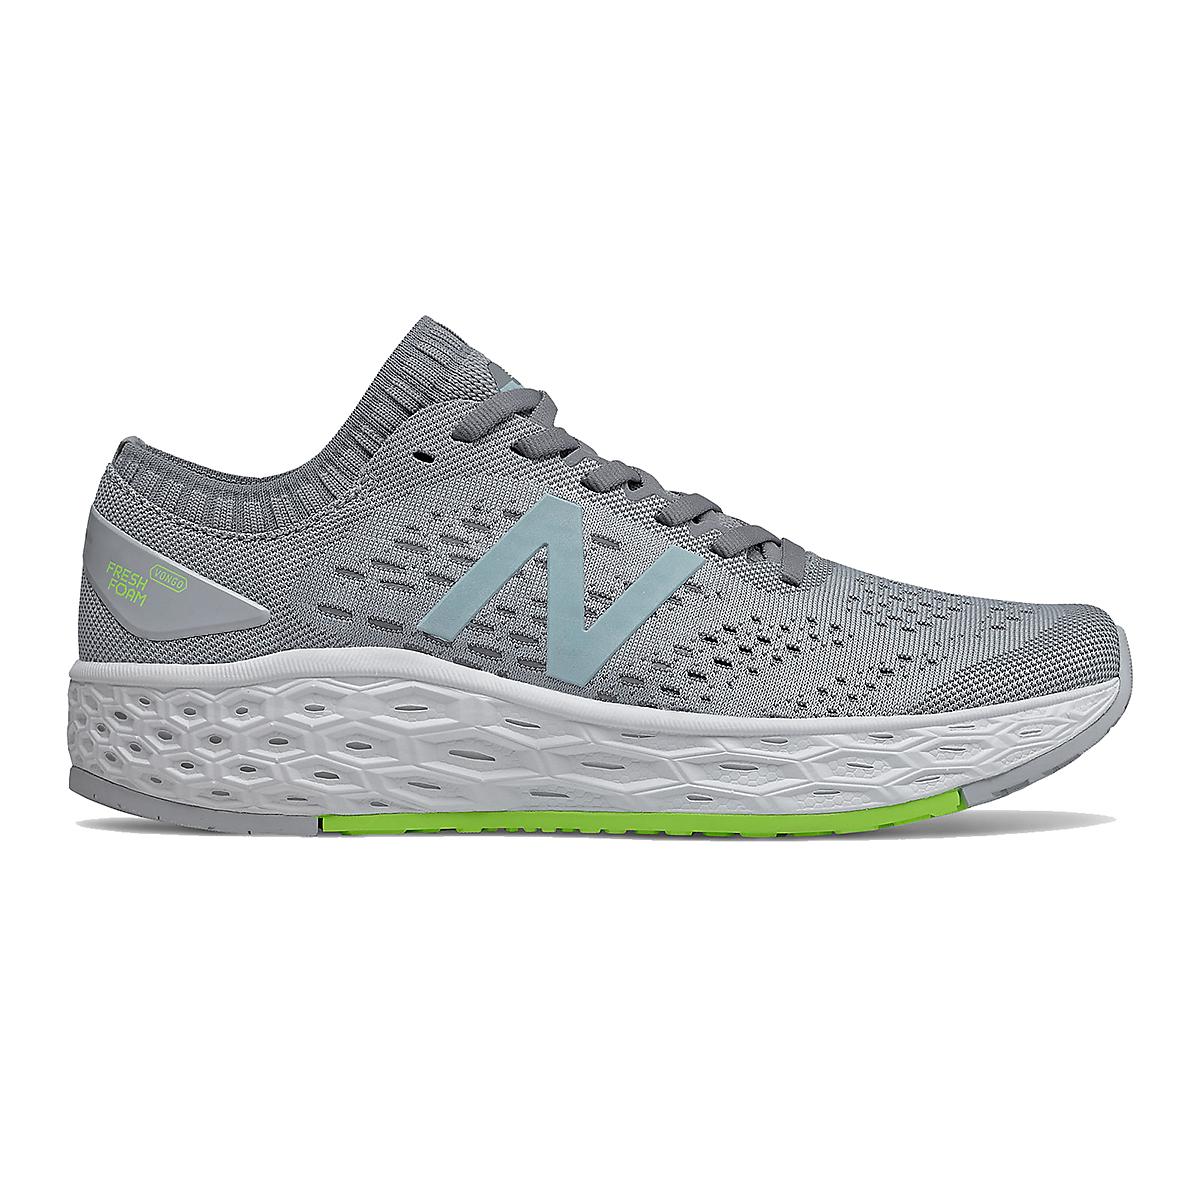 Women's New Balance Fresh Foam Vongo V4 Running Shoe - Color: Light Aluminum - Size: 5.5 - Width: Regular, Light Aluminum, large, image 1